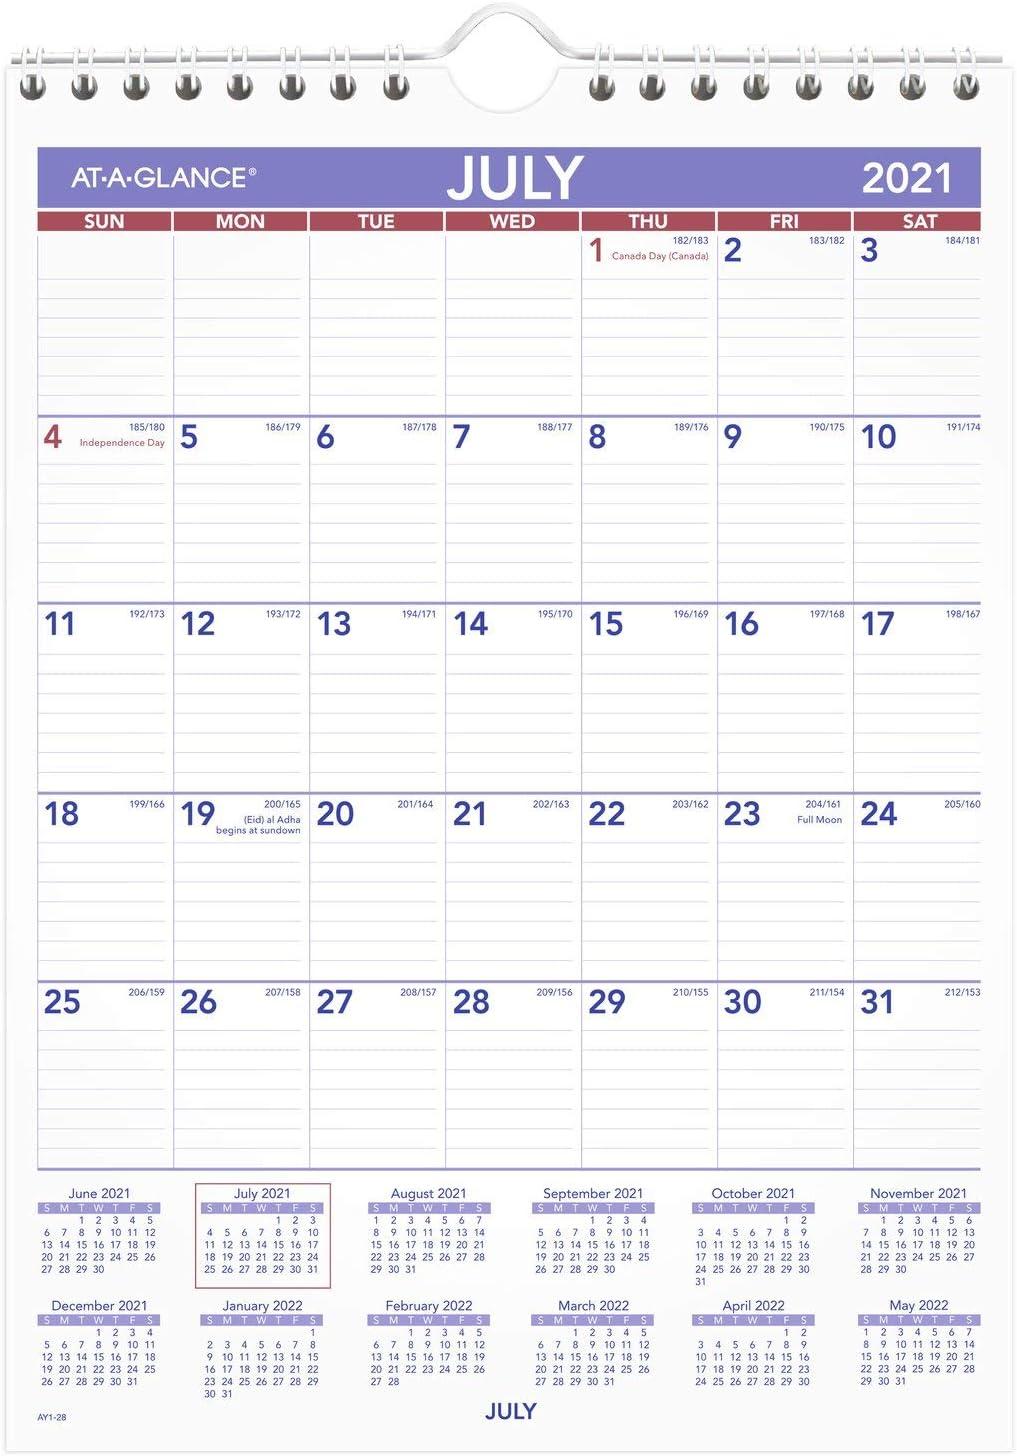 At A Glance Wall Calendar 2022.Amazon Com Academic Wall Calendar 2021 2022 At A Glance Monthly 11 X 8 Small For School Teacher Student Ay12822 Office Products